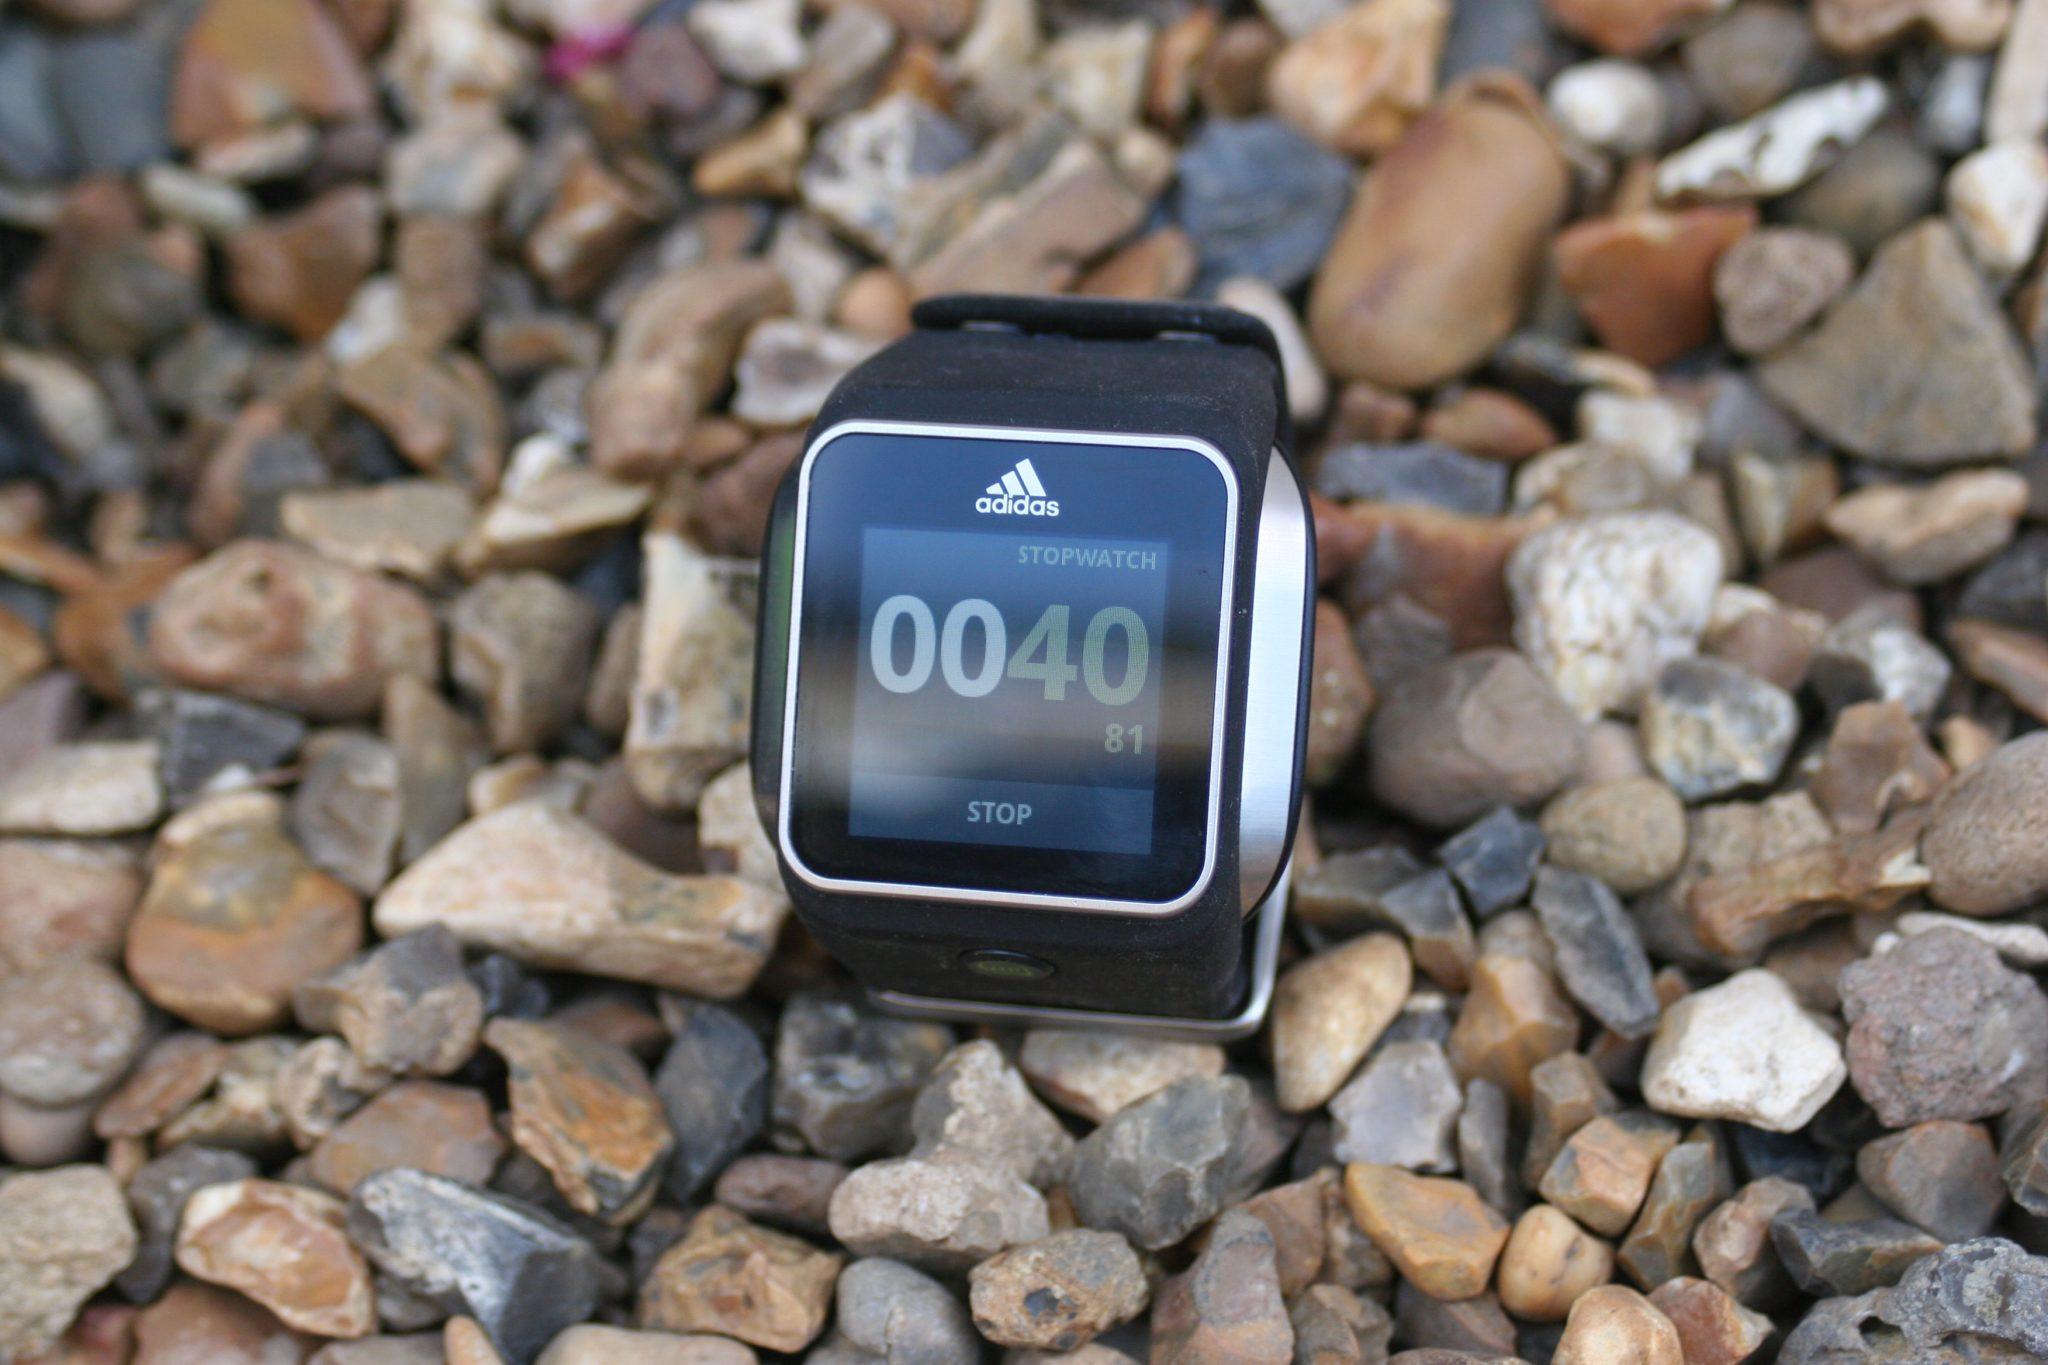 adidas miCoach Smart Run Optical HR and GPS Running Watch